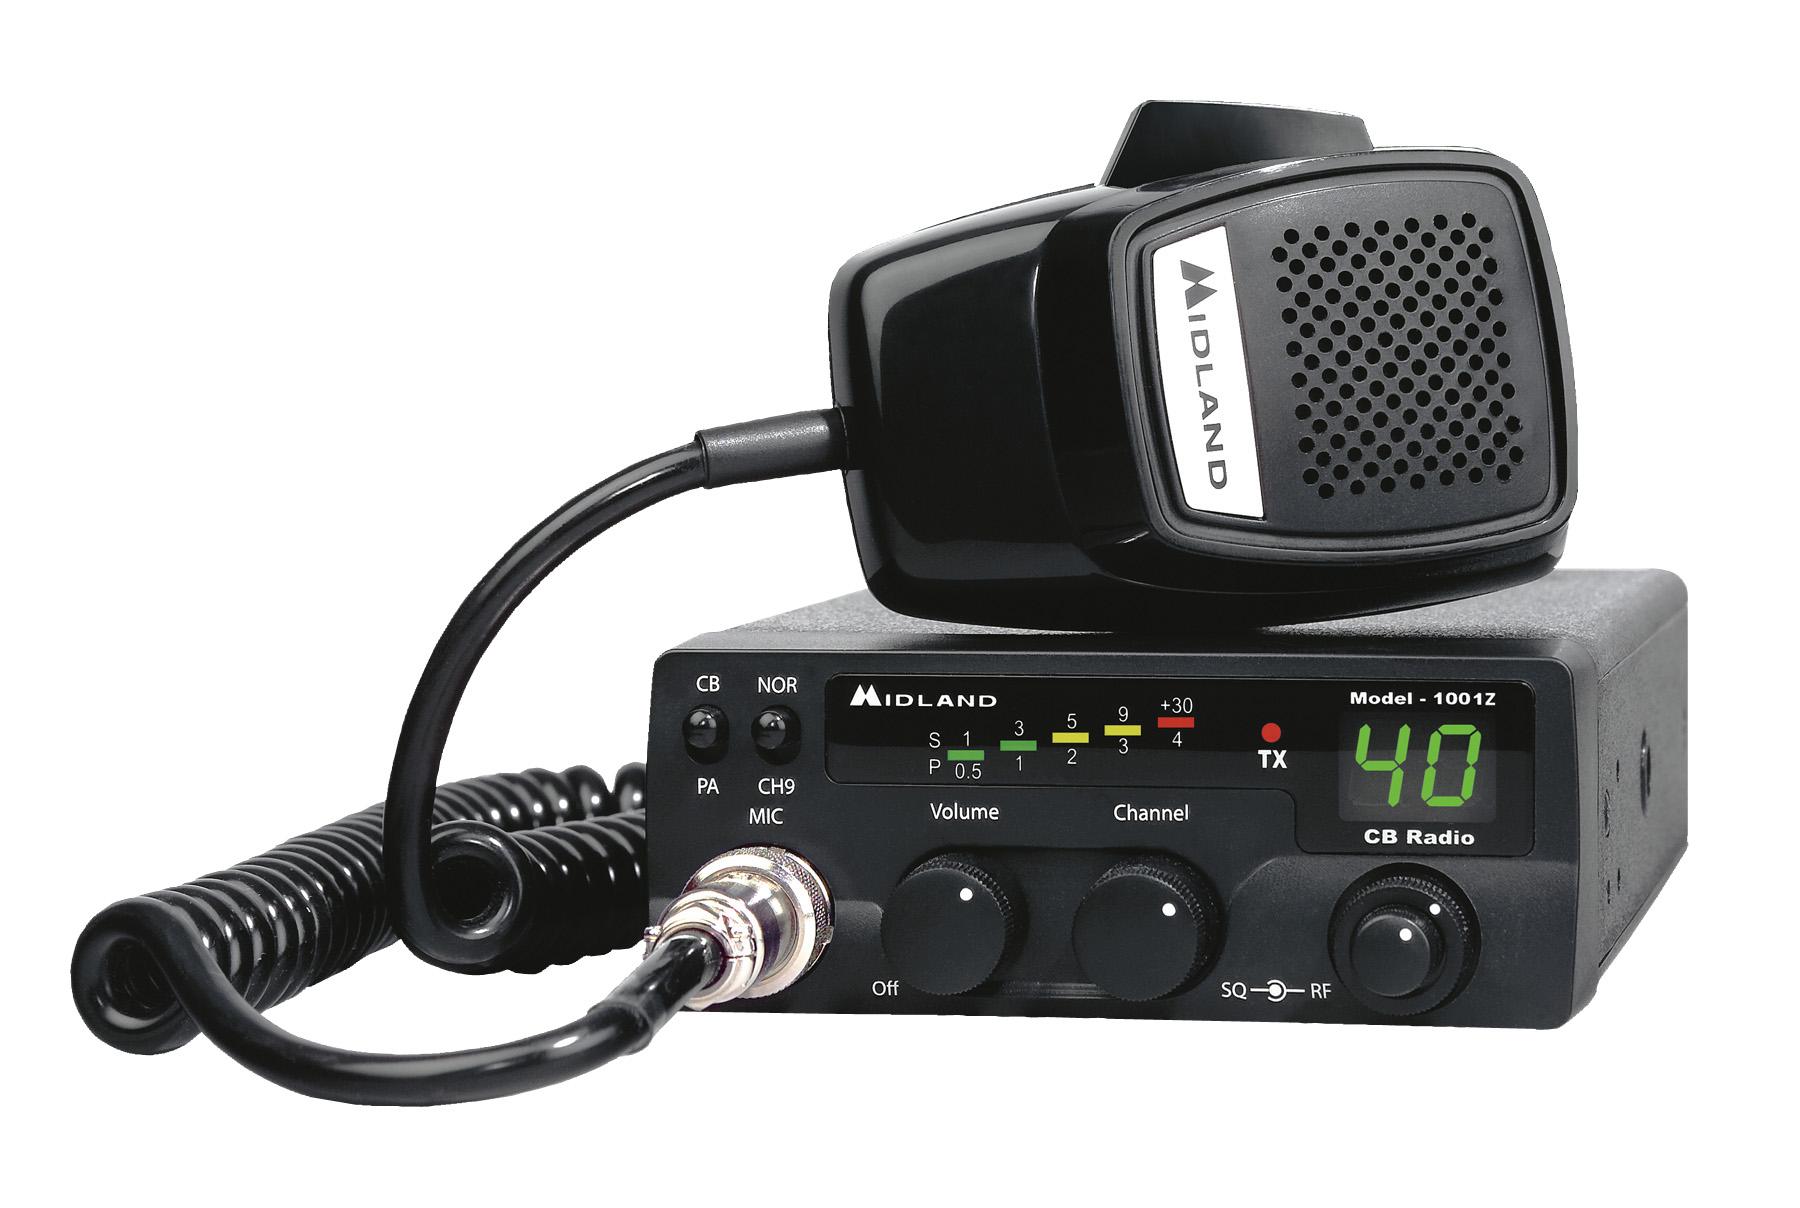 1001Z - Midland Mobile CB Radio